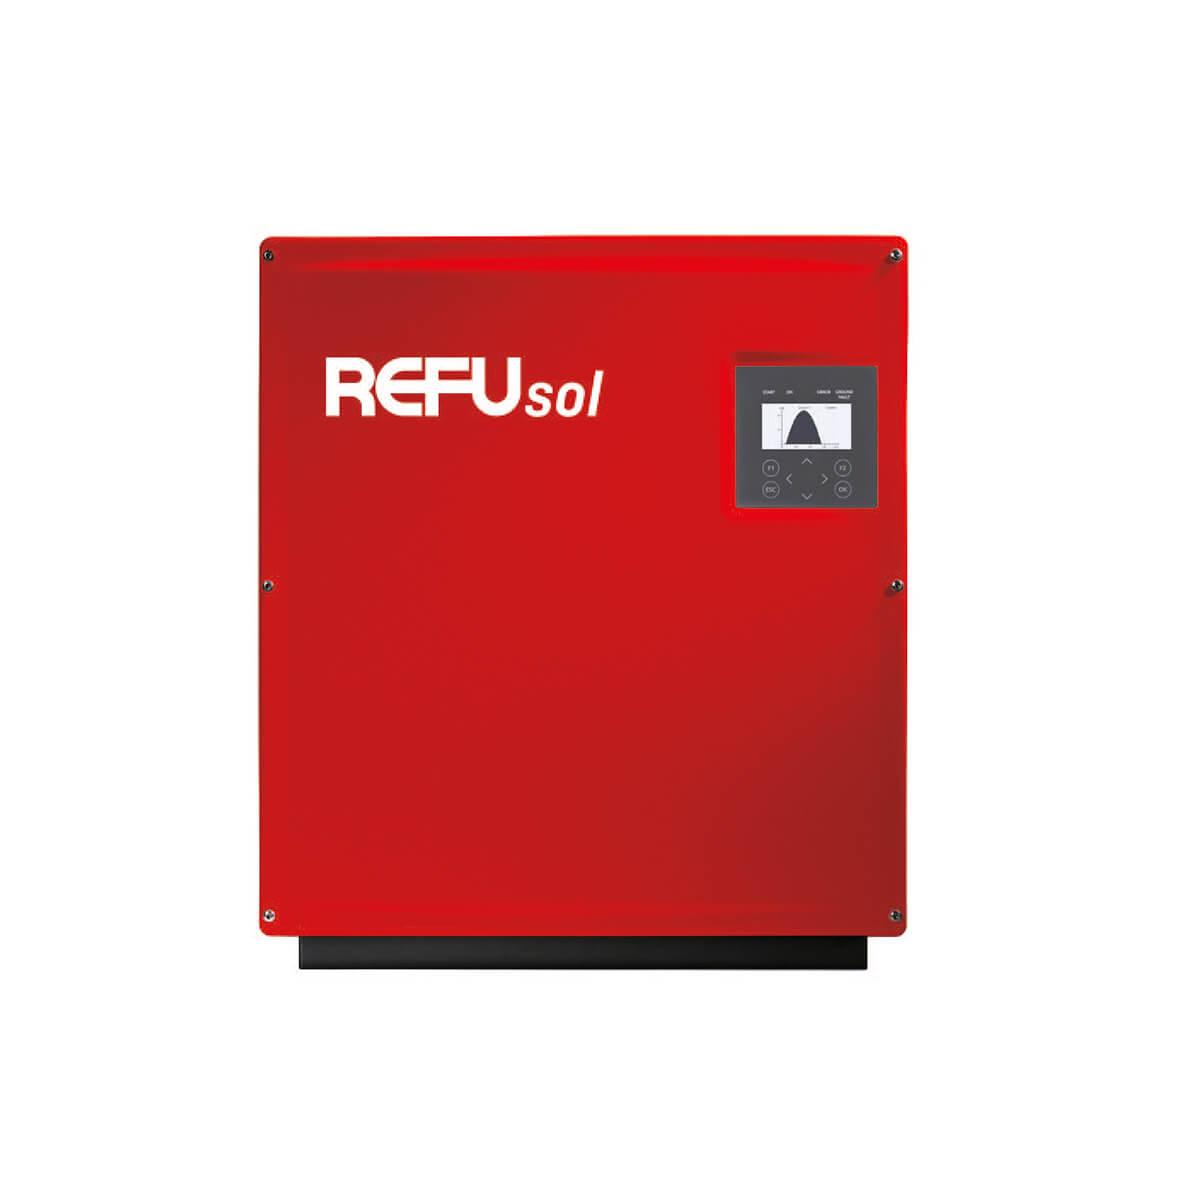 refusol 20kW inverter, refusol 20k 20kW inverter, refusol 20k inverter, refusol 20k, refusol 20k 20 kW